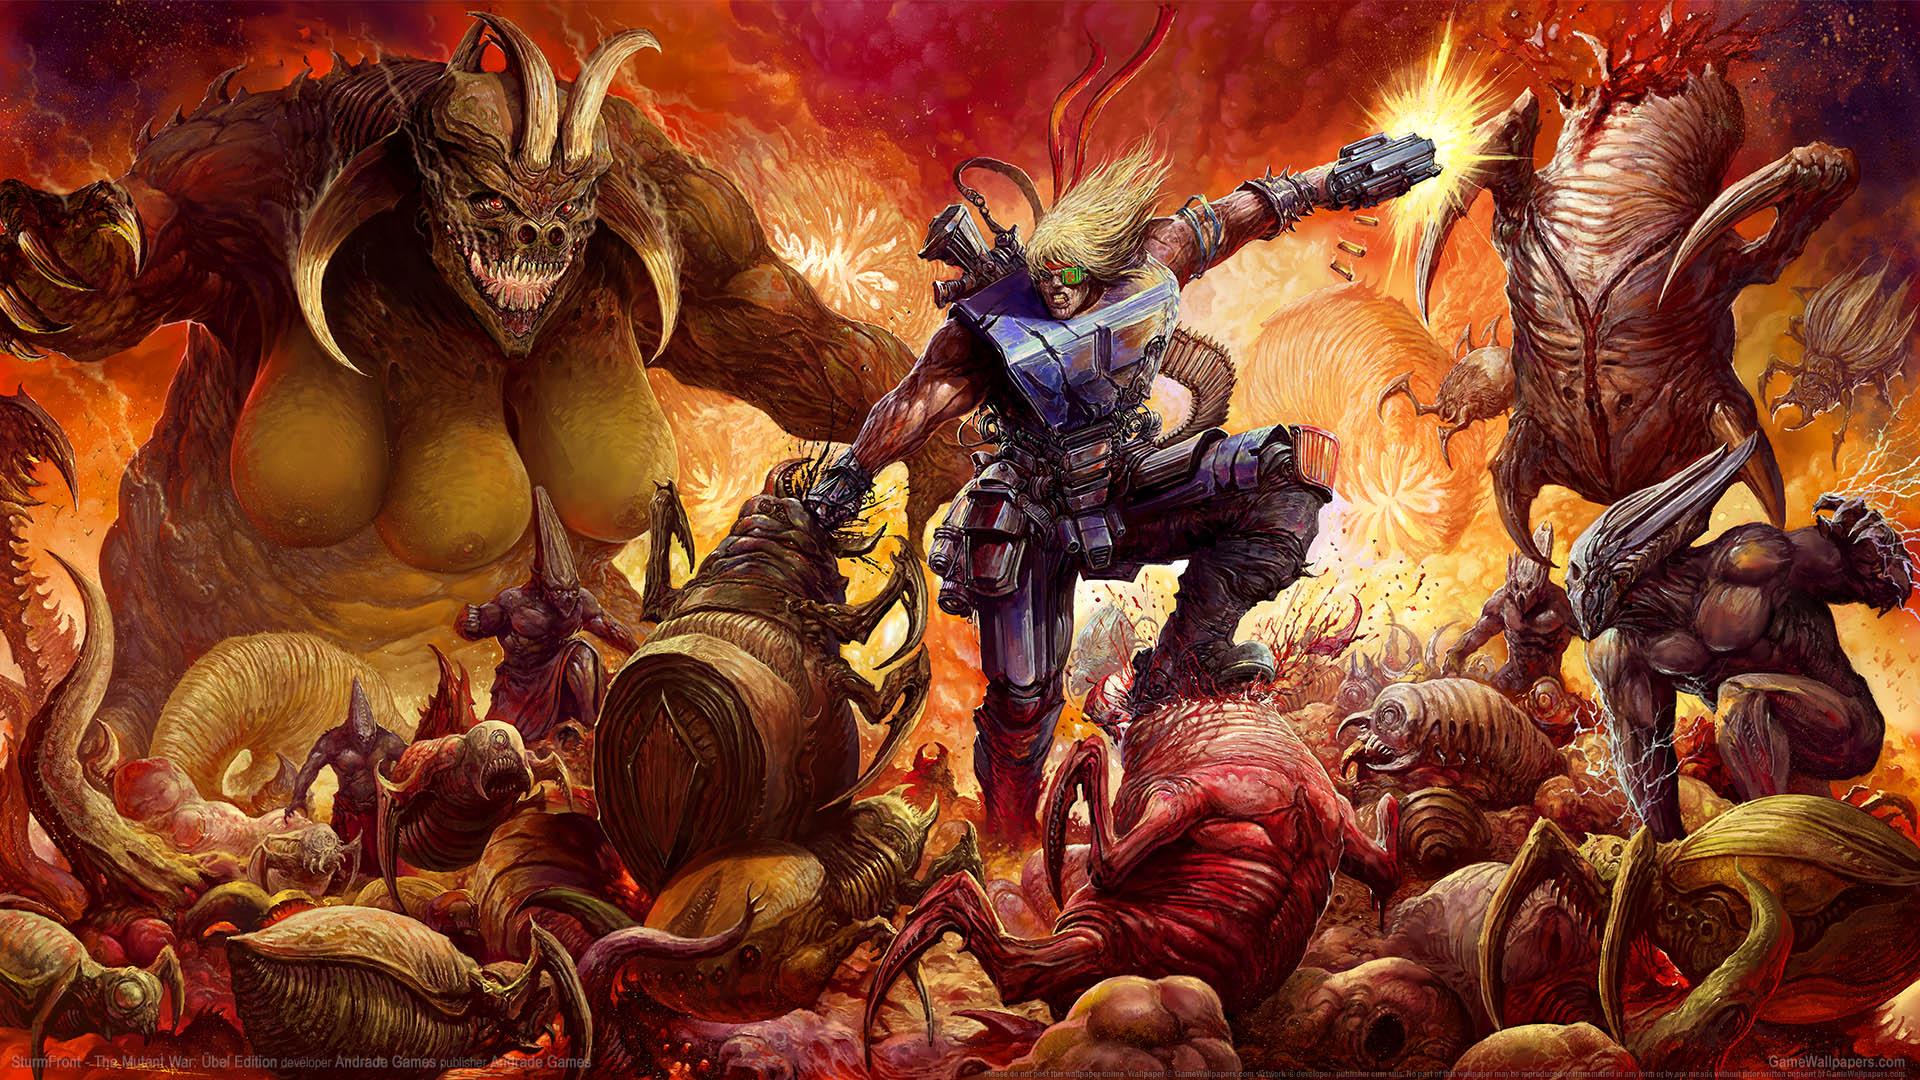 SturmFront - The Mutant War: Ubel Edition wallpaper 01 1920x1080